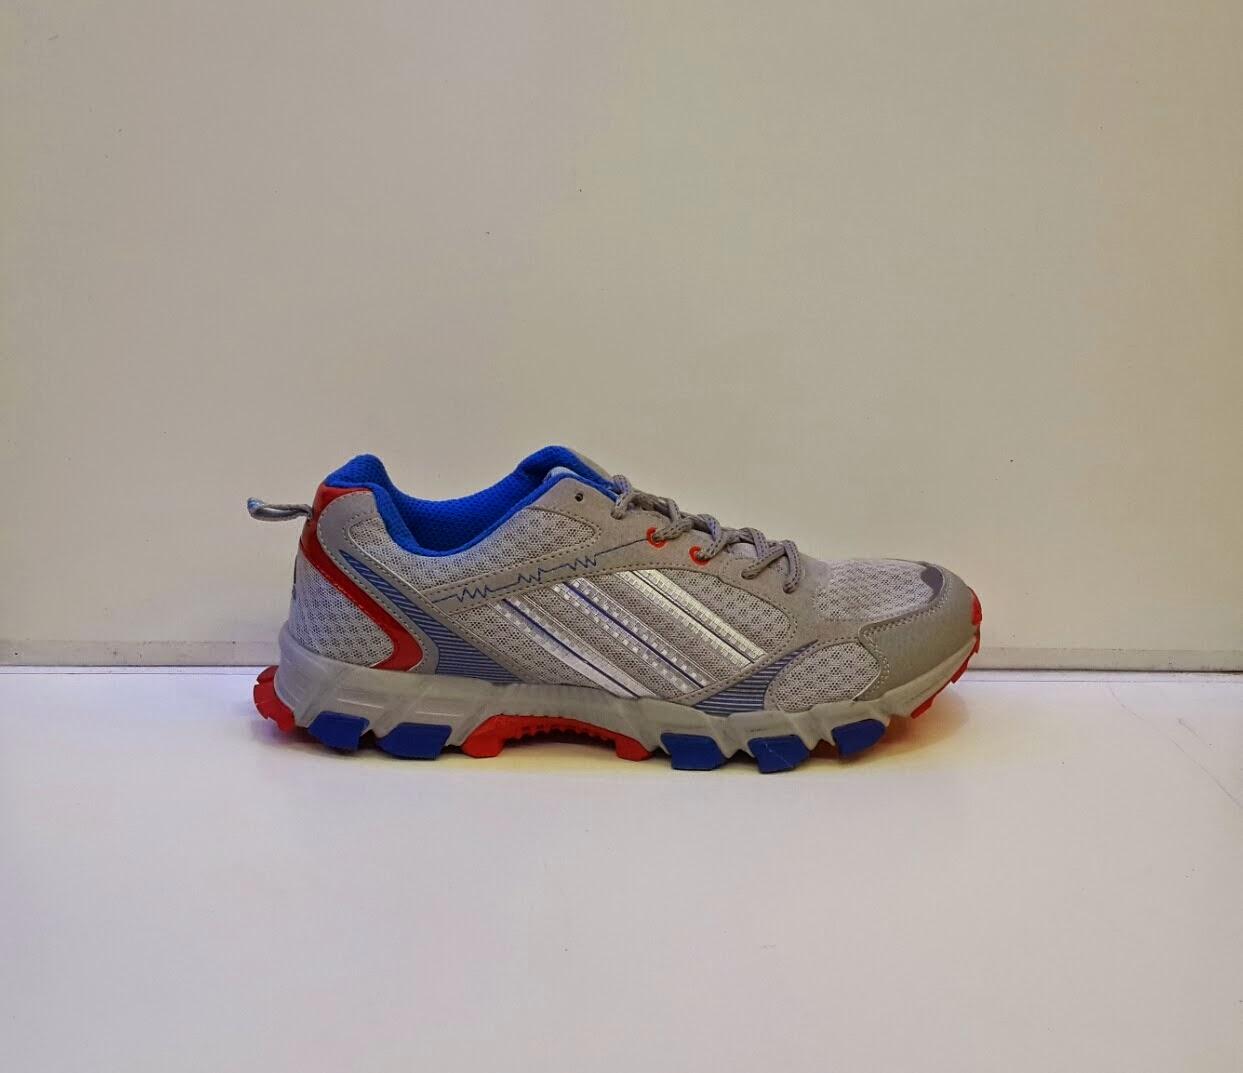 Adidas Supernova Abu,Adidas Running,Adidas Import.